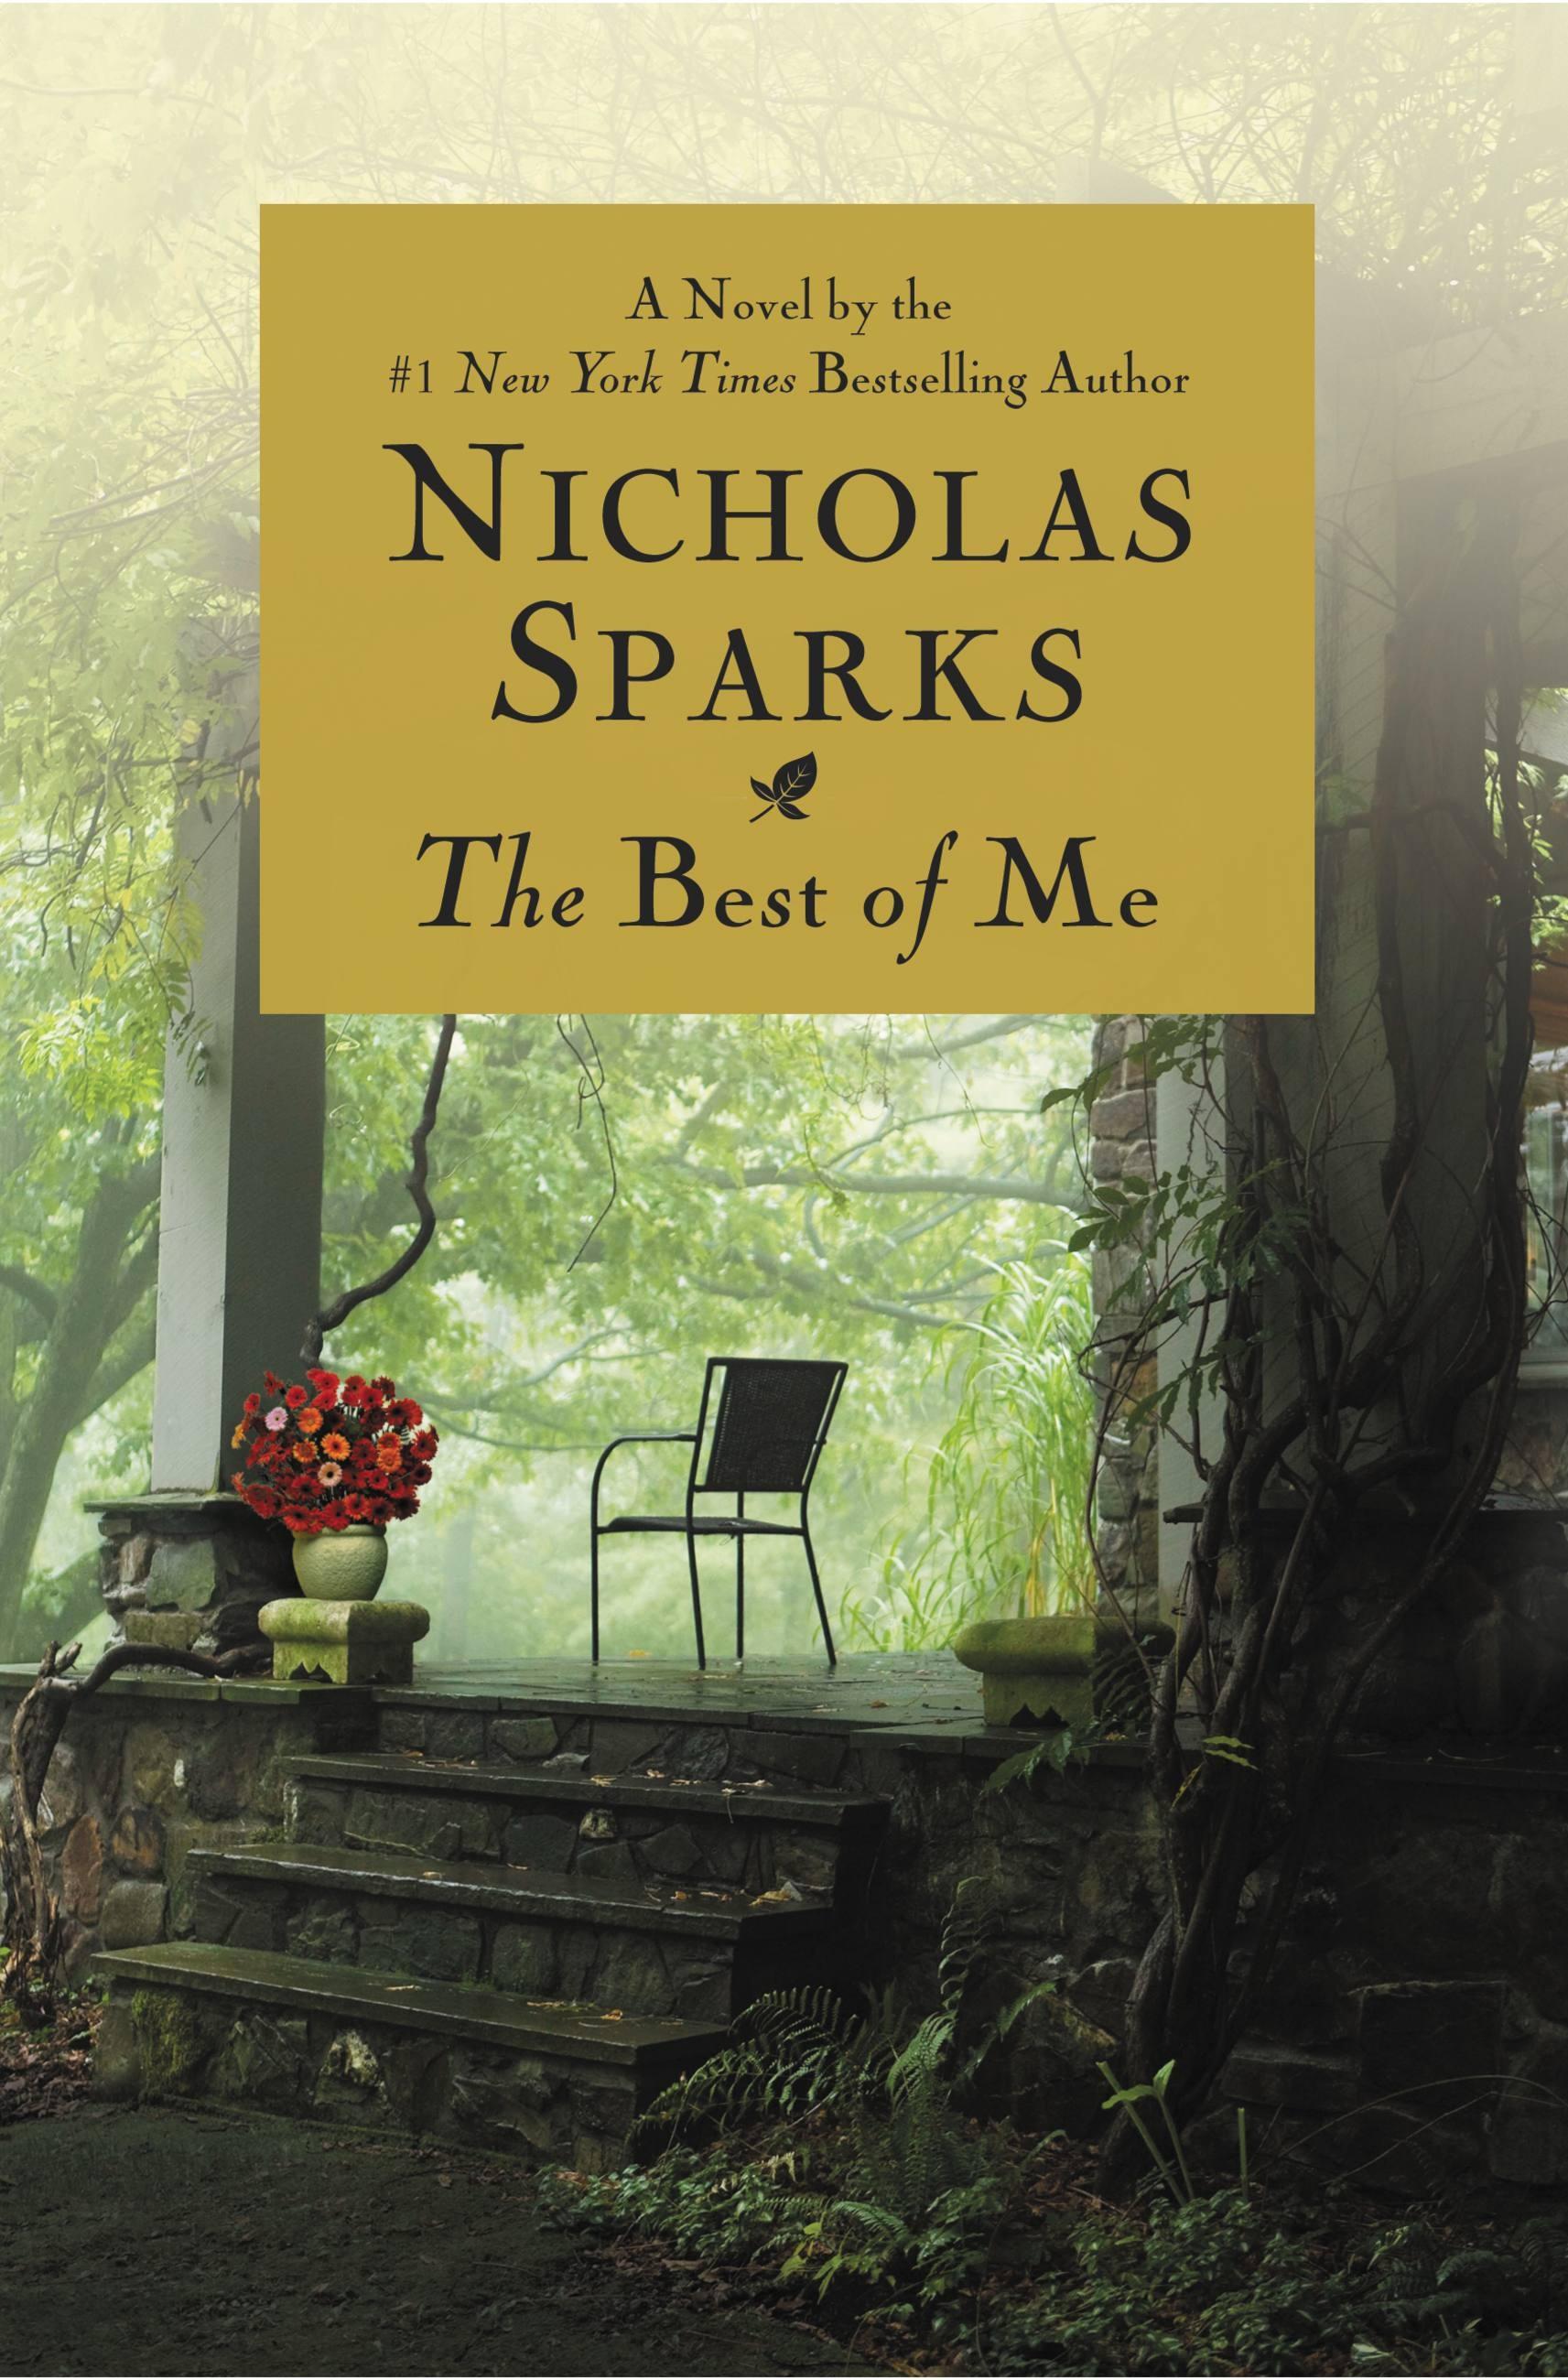 Ebook choice sparks nicholas the